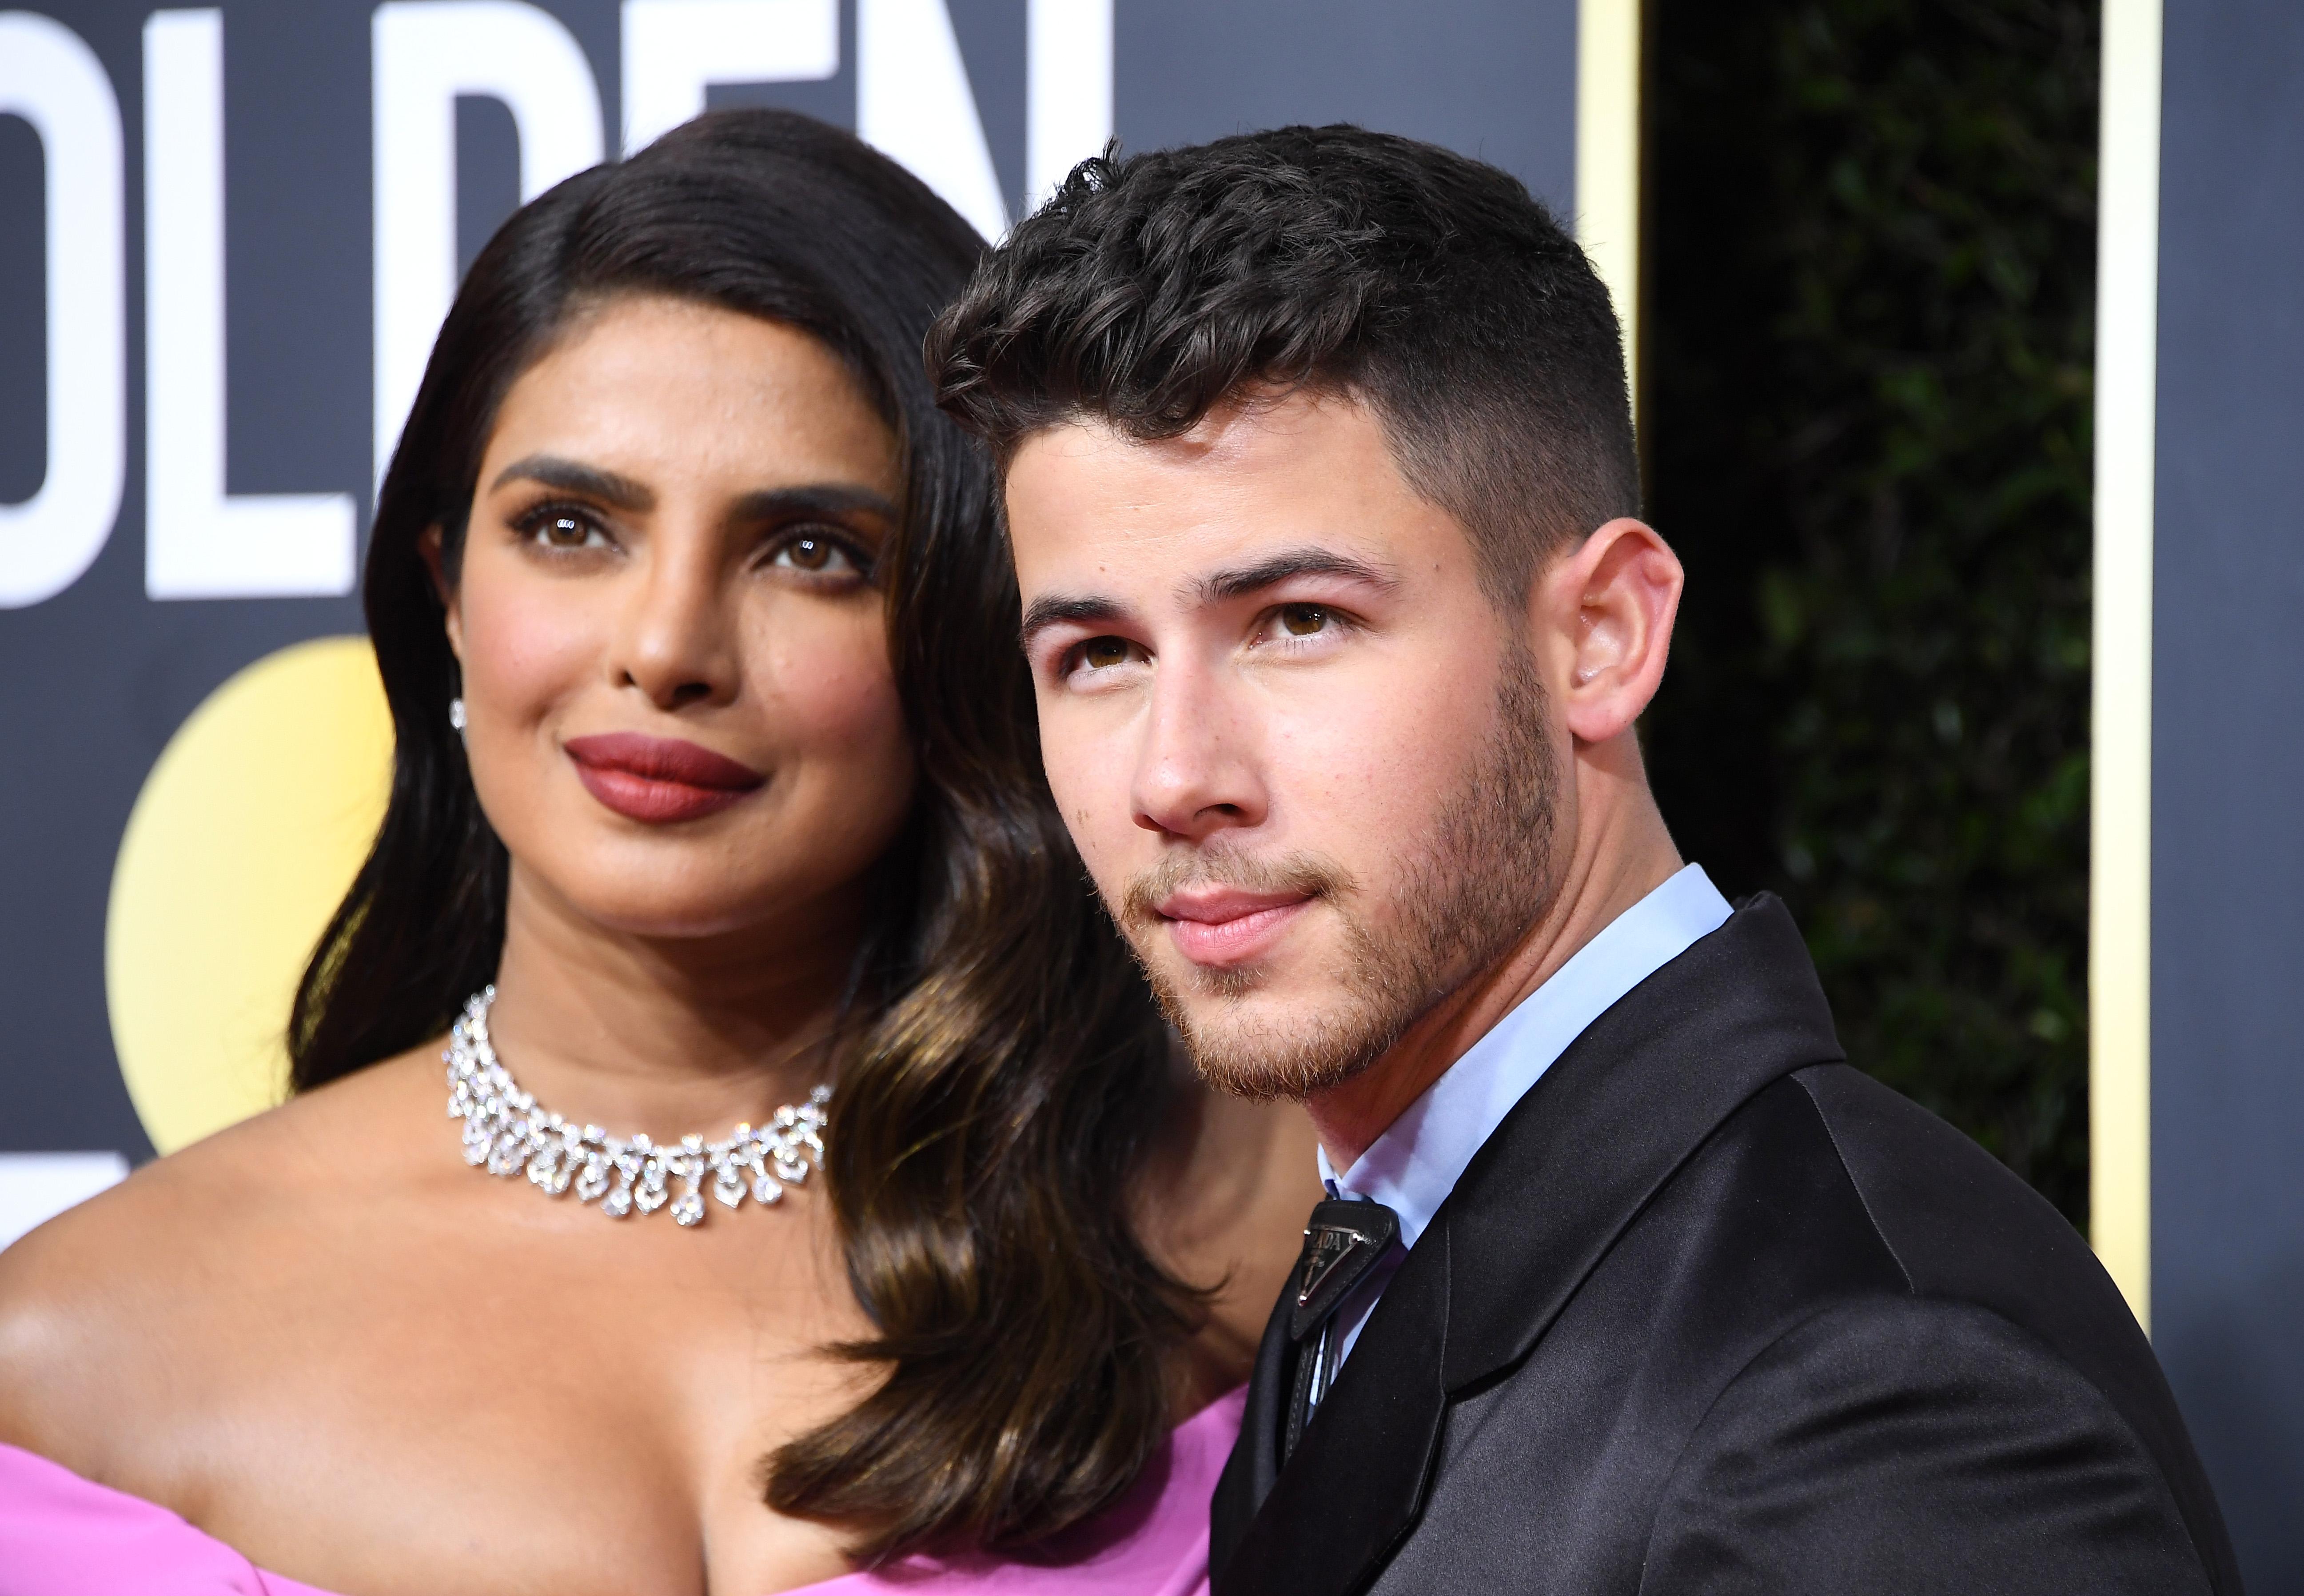 Priyanka Chopra Reveals What Made Her Decide to Date Nick Jonas